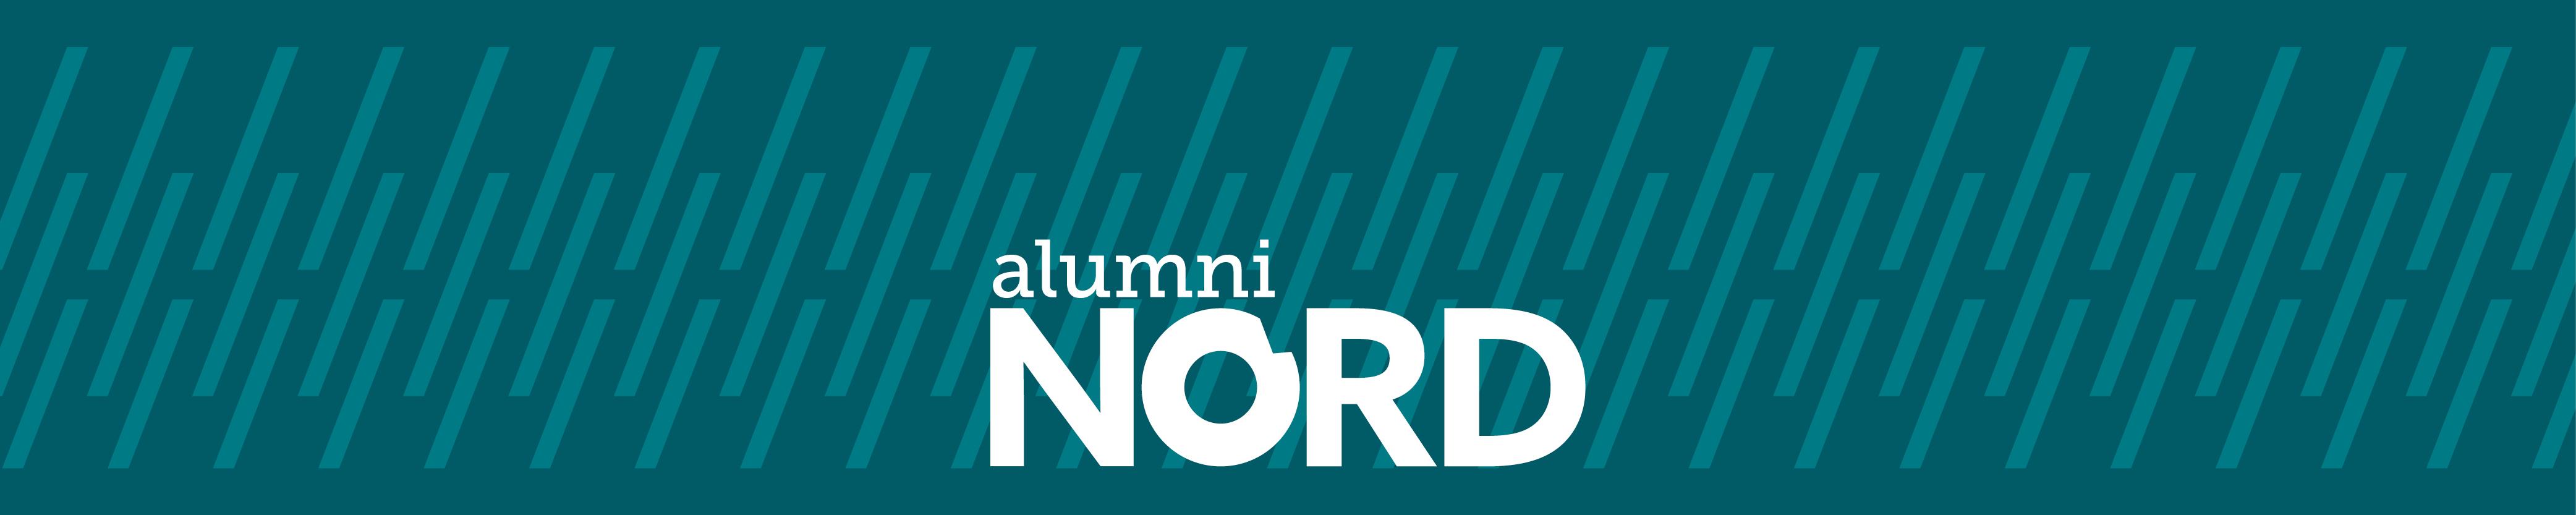 Nord alumni